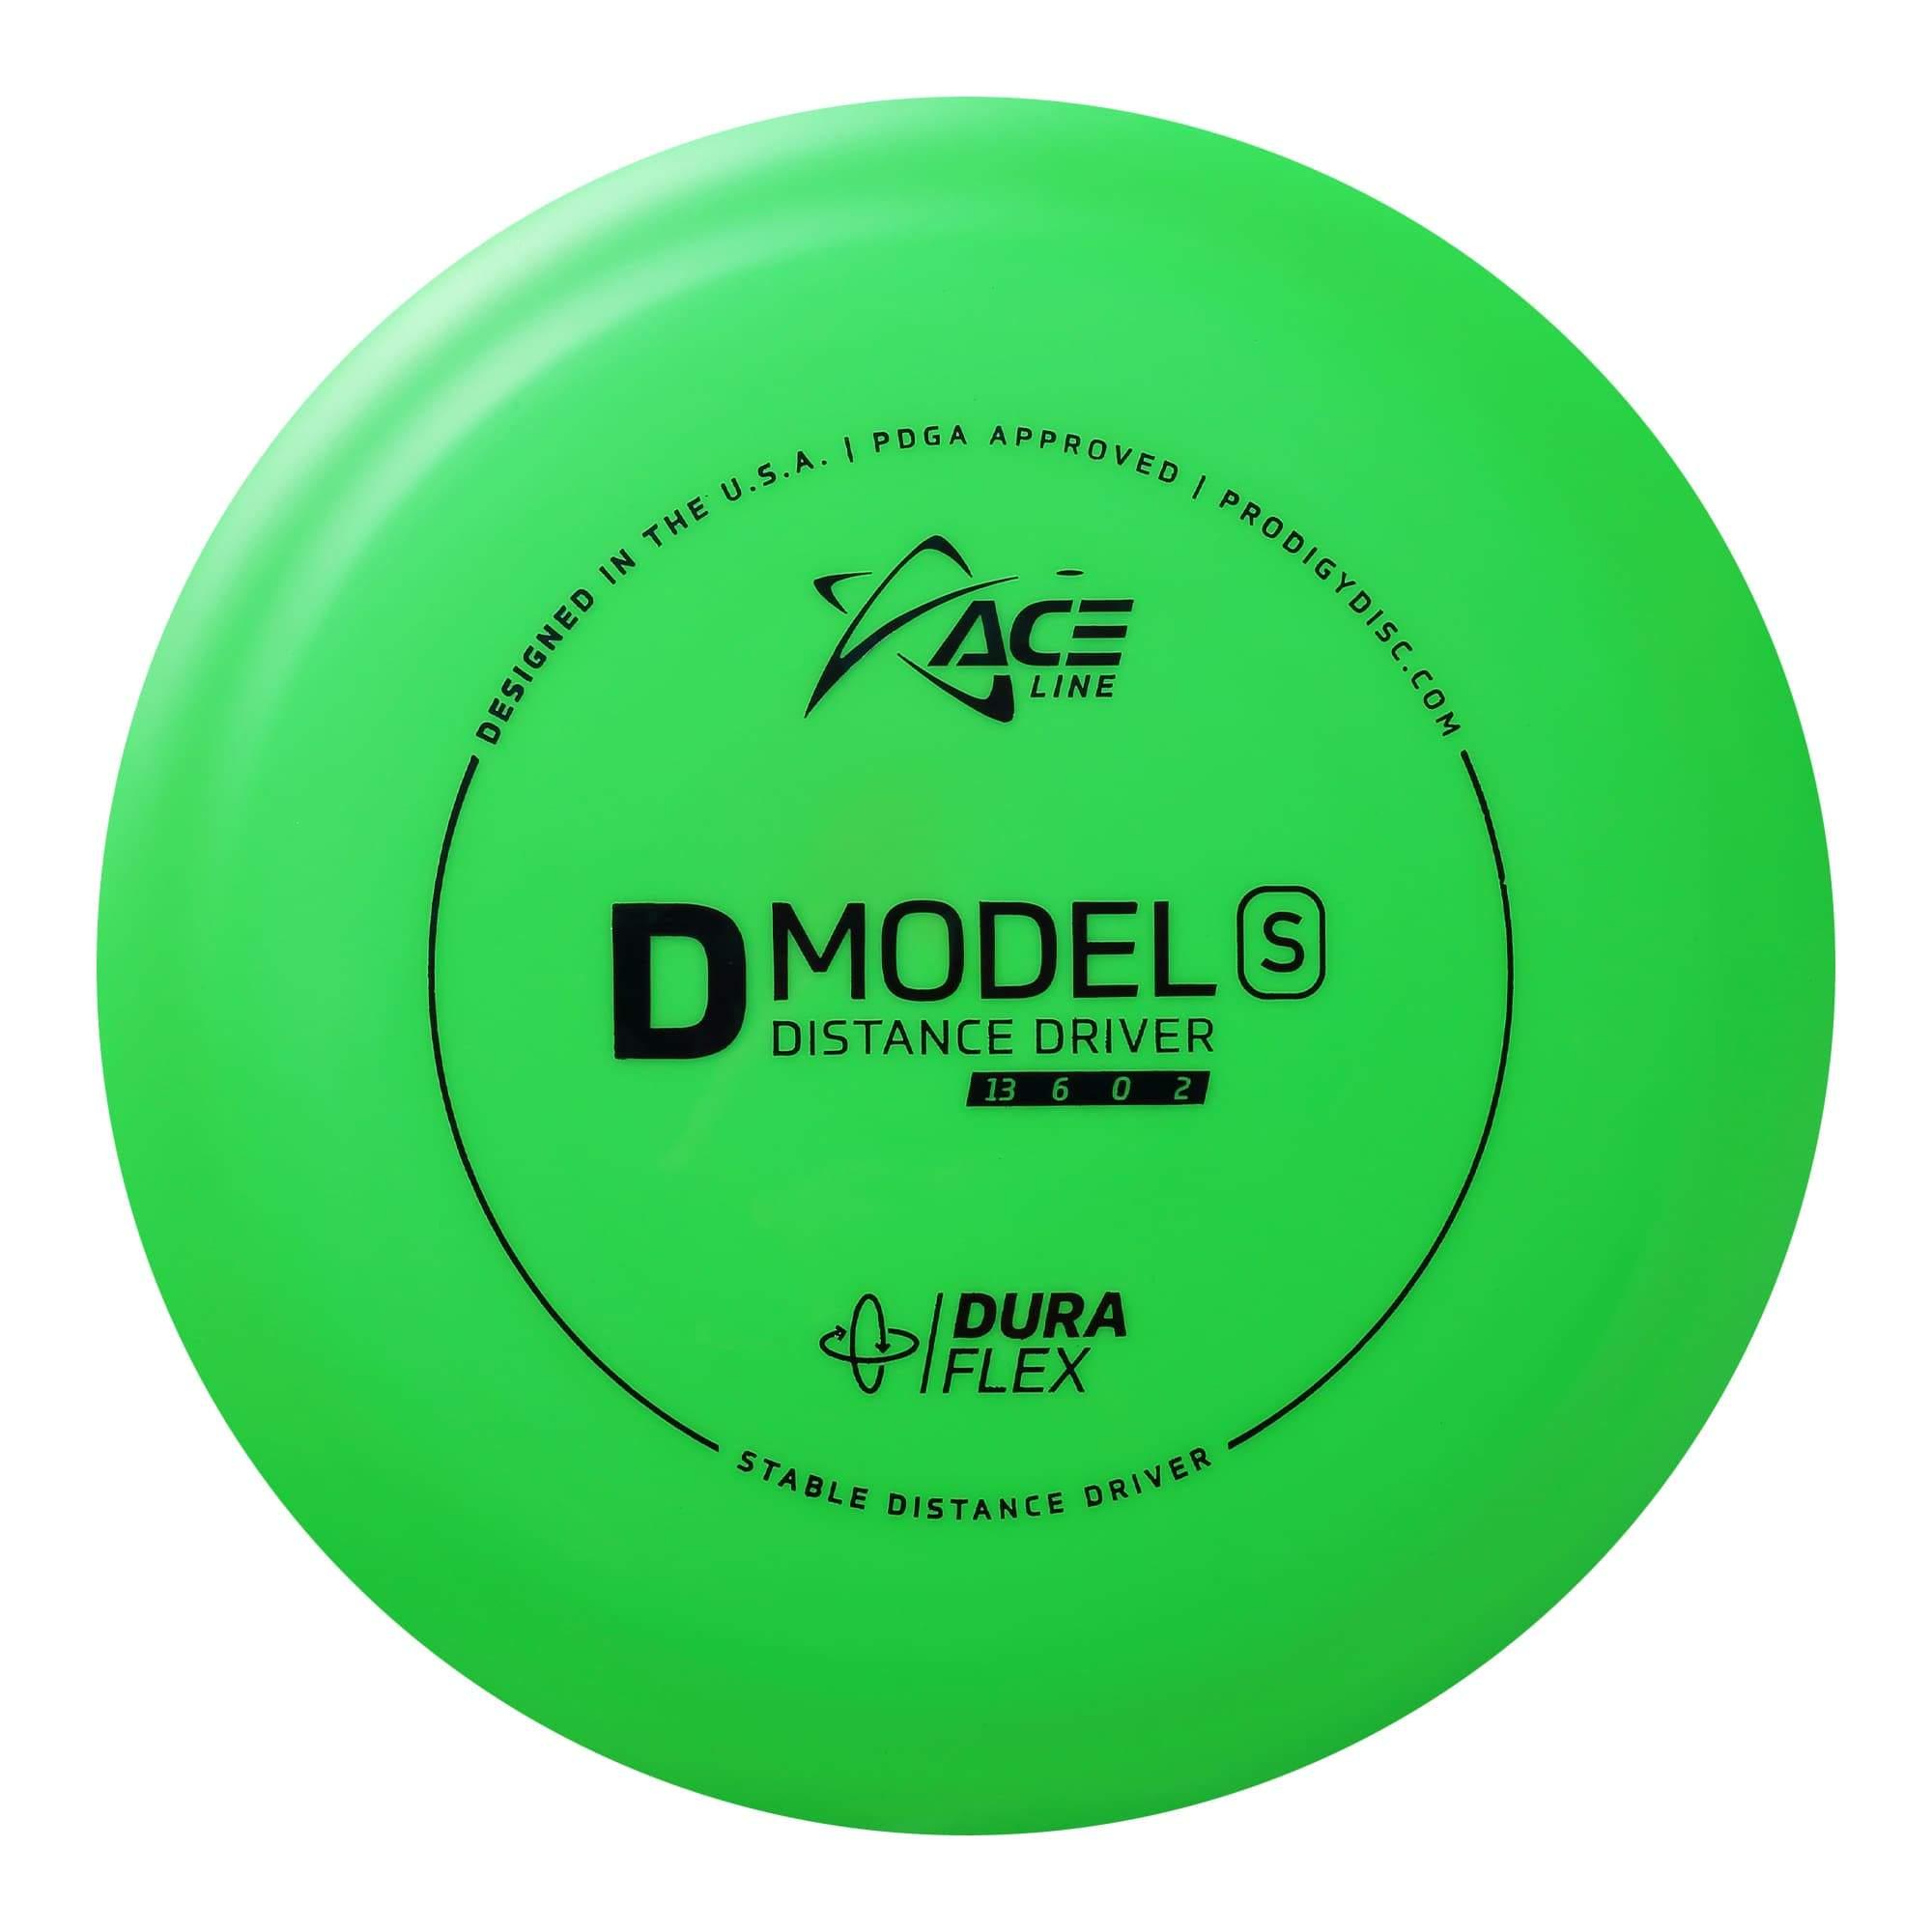 Prodigy Ace Duraflex D-Model S